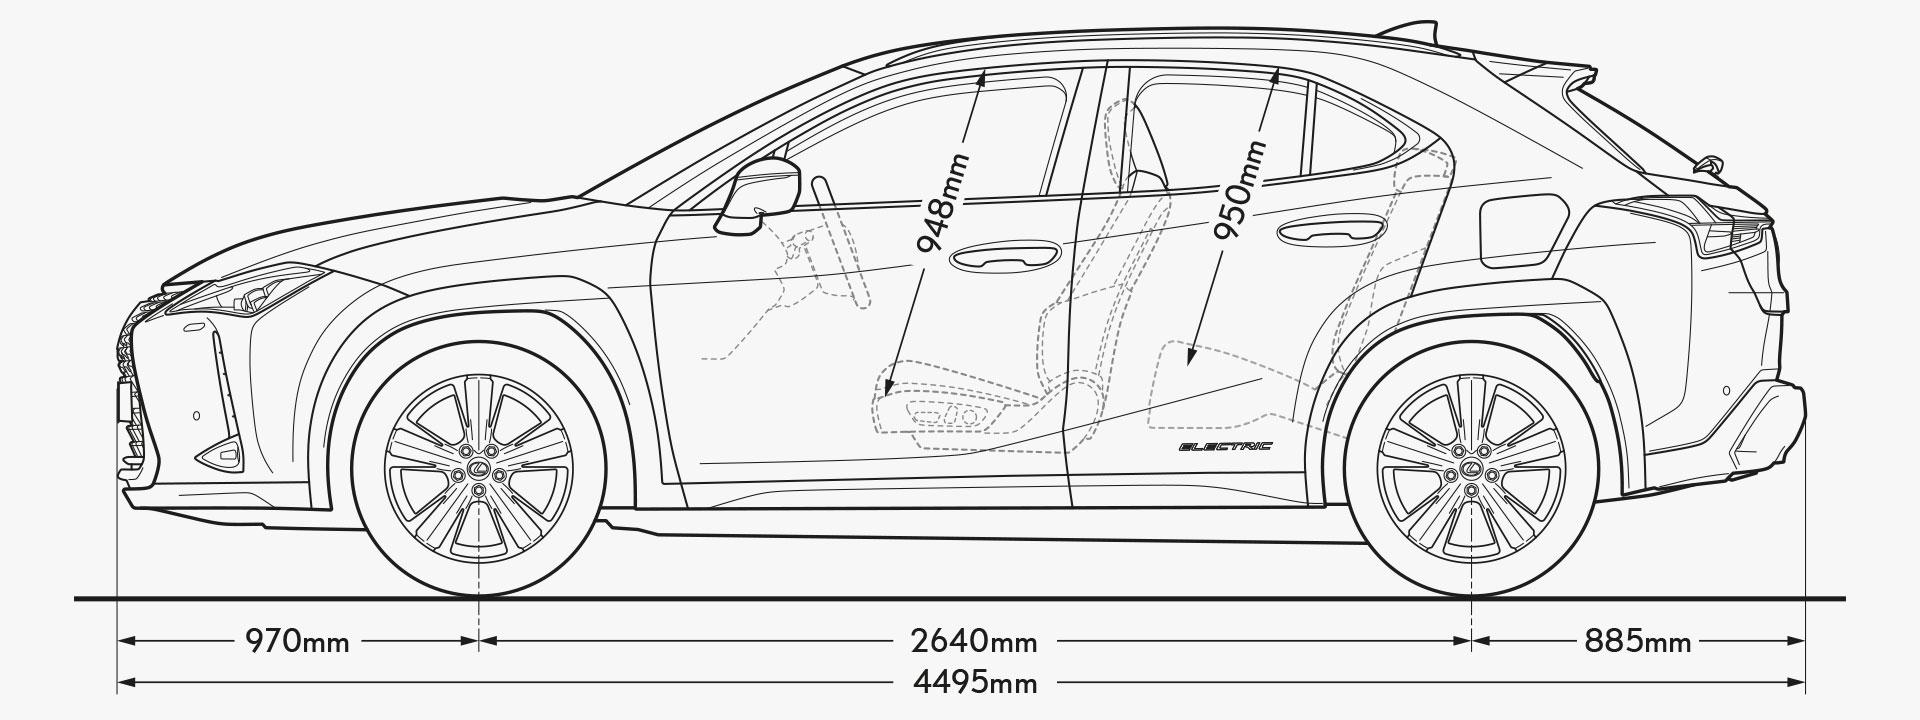 UX 300e Side Dimensions Image